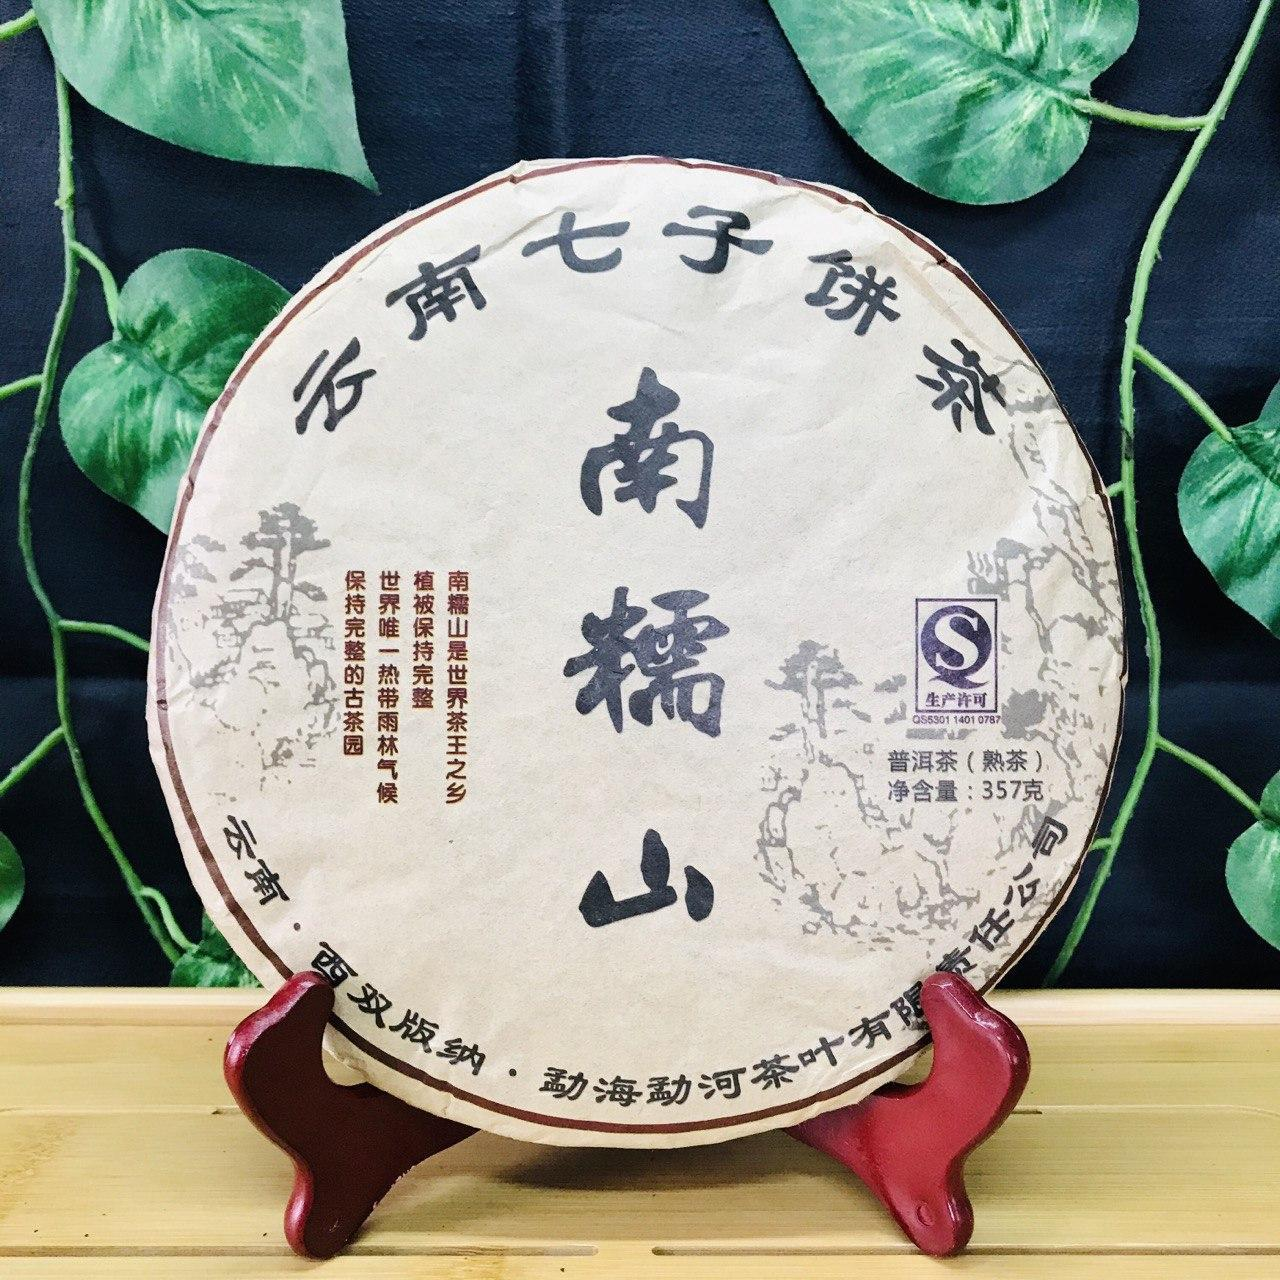 Классический шу пуэр из Юннани 357 грамм